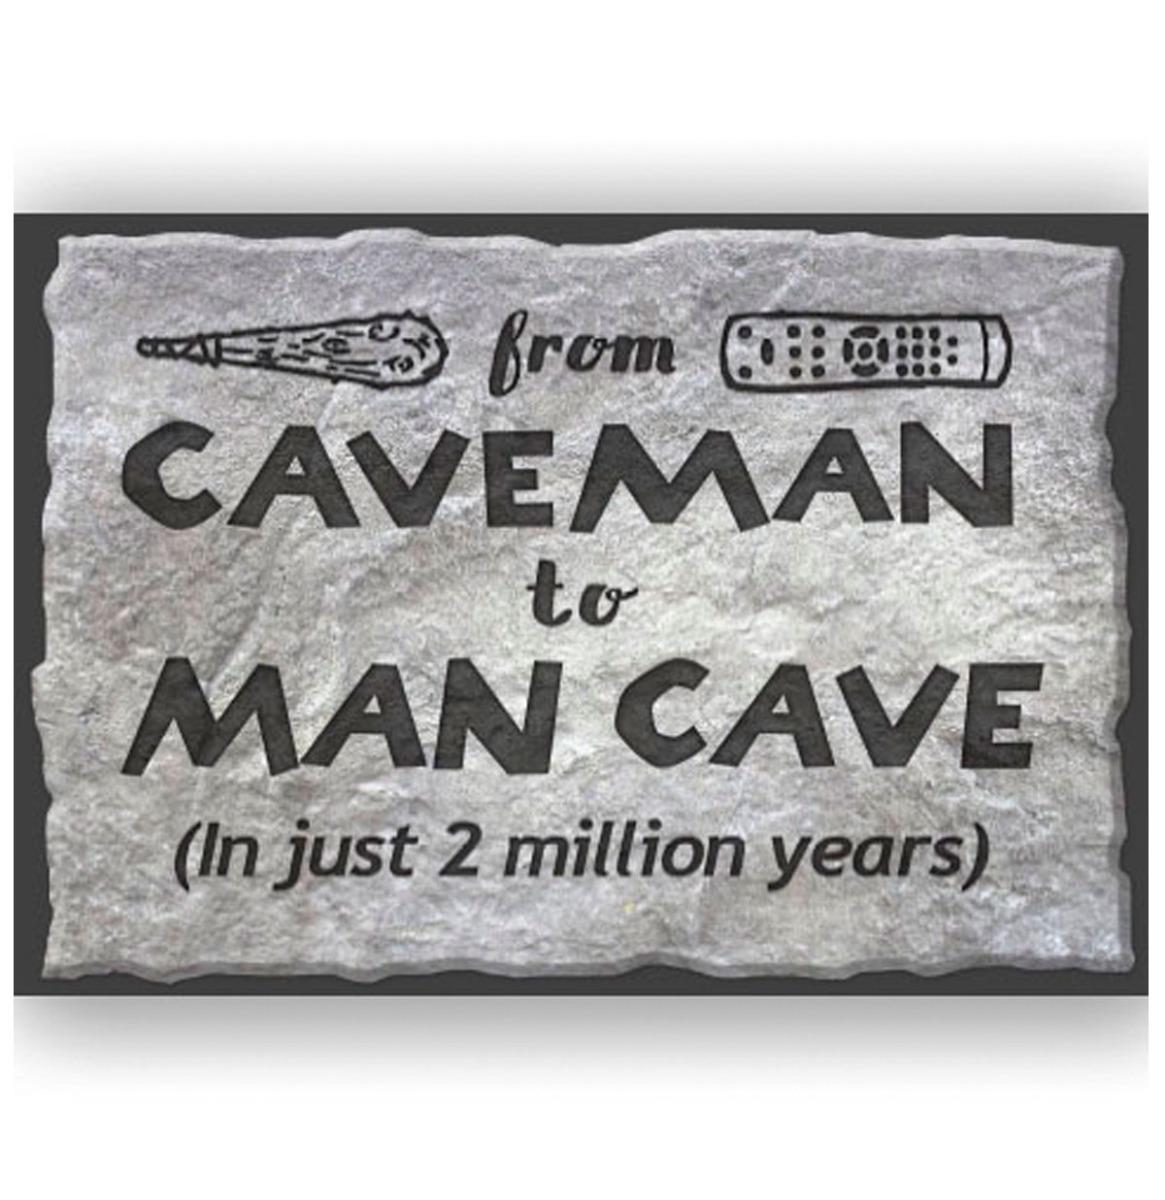 From Caveman To Mancave Metalen Bord Met Reliëf 43 x 31 cm